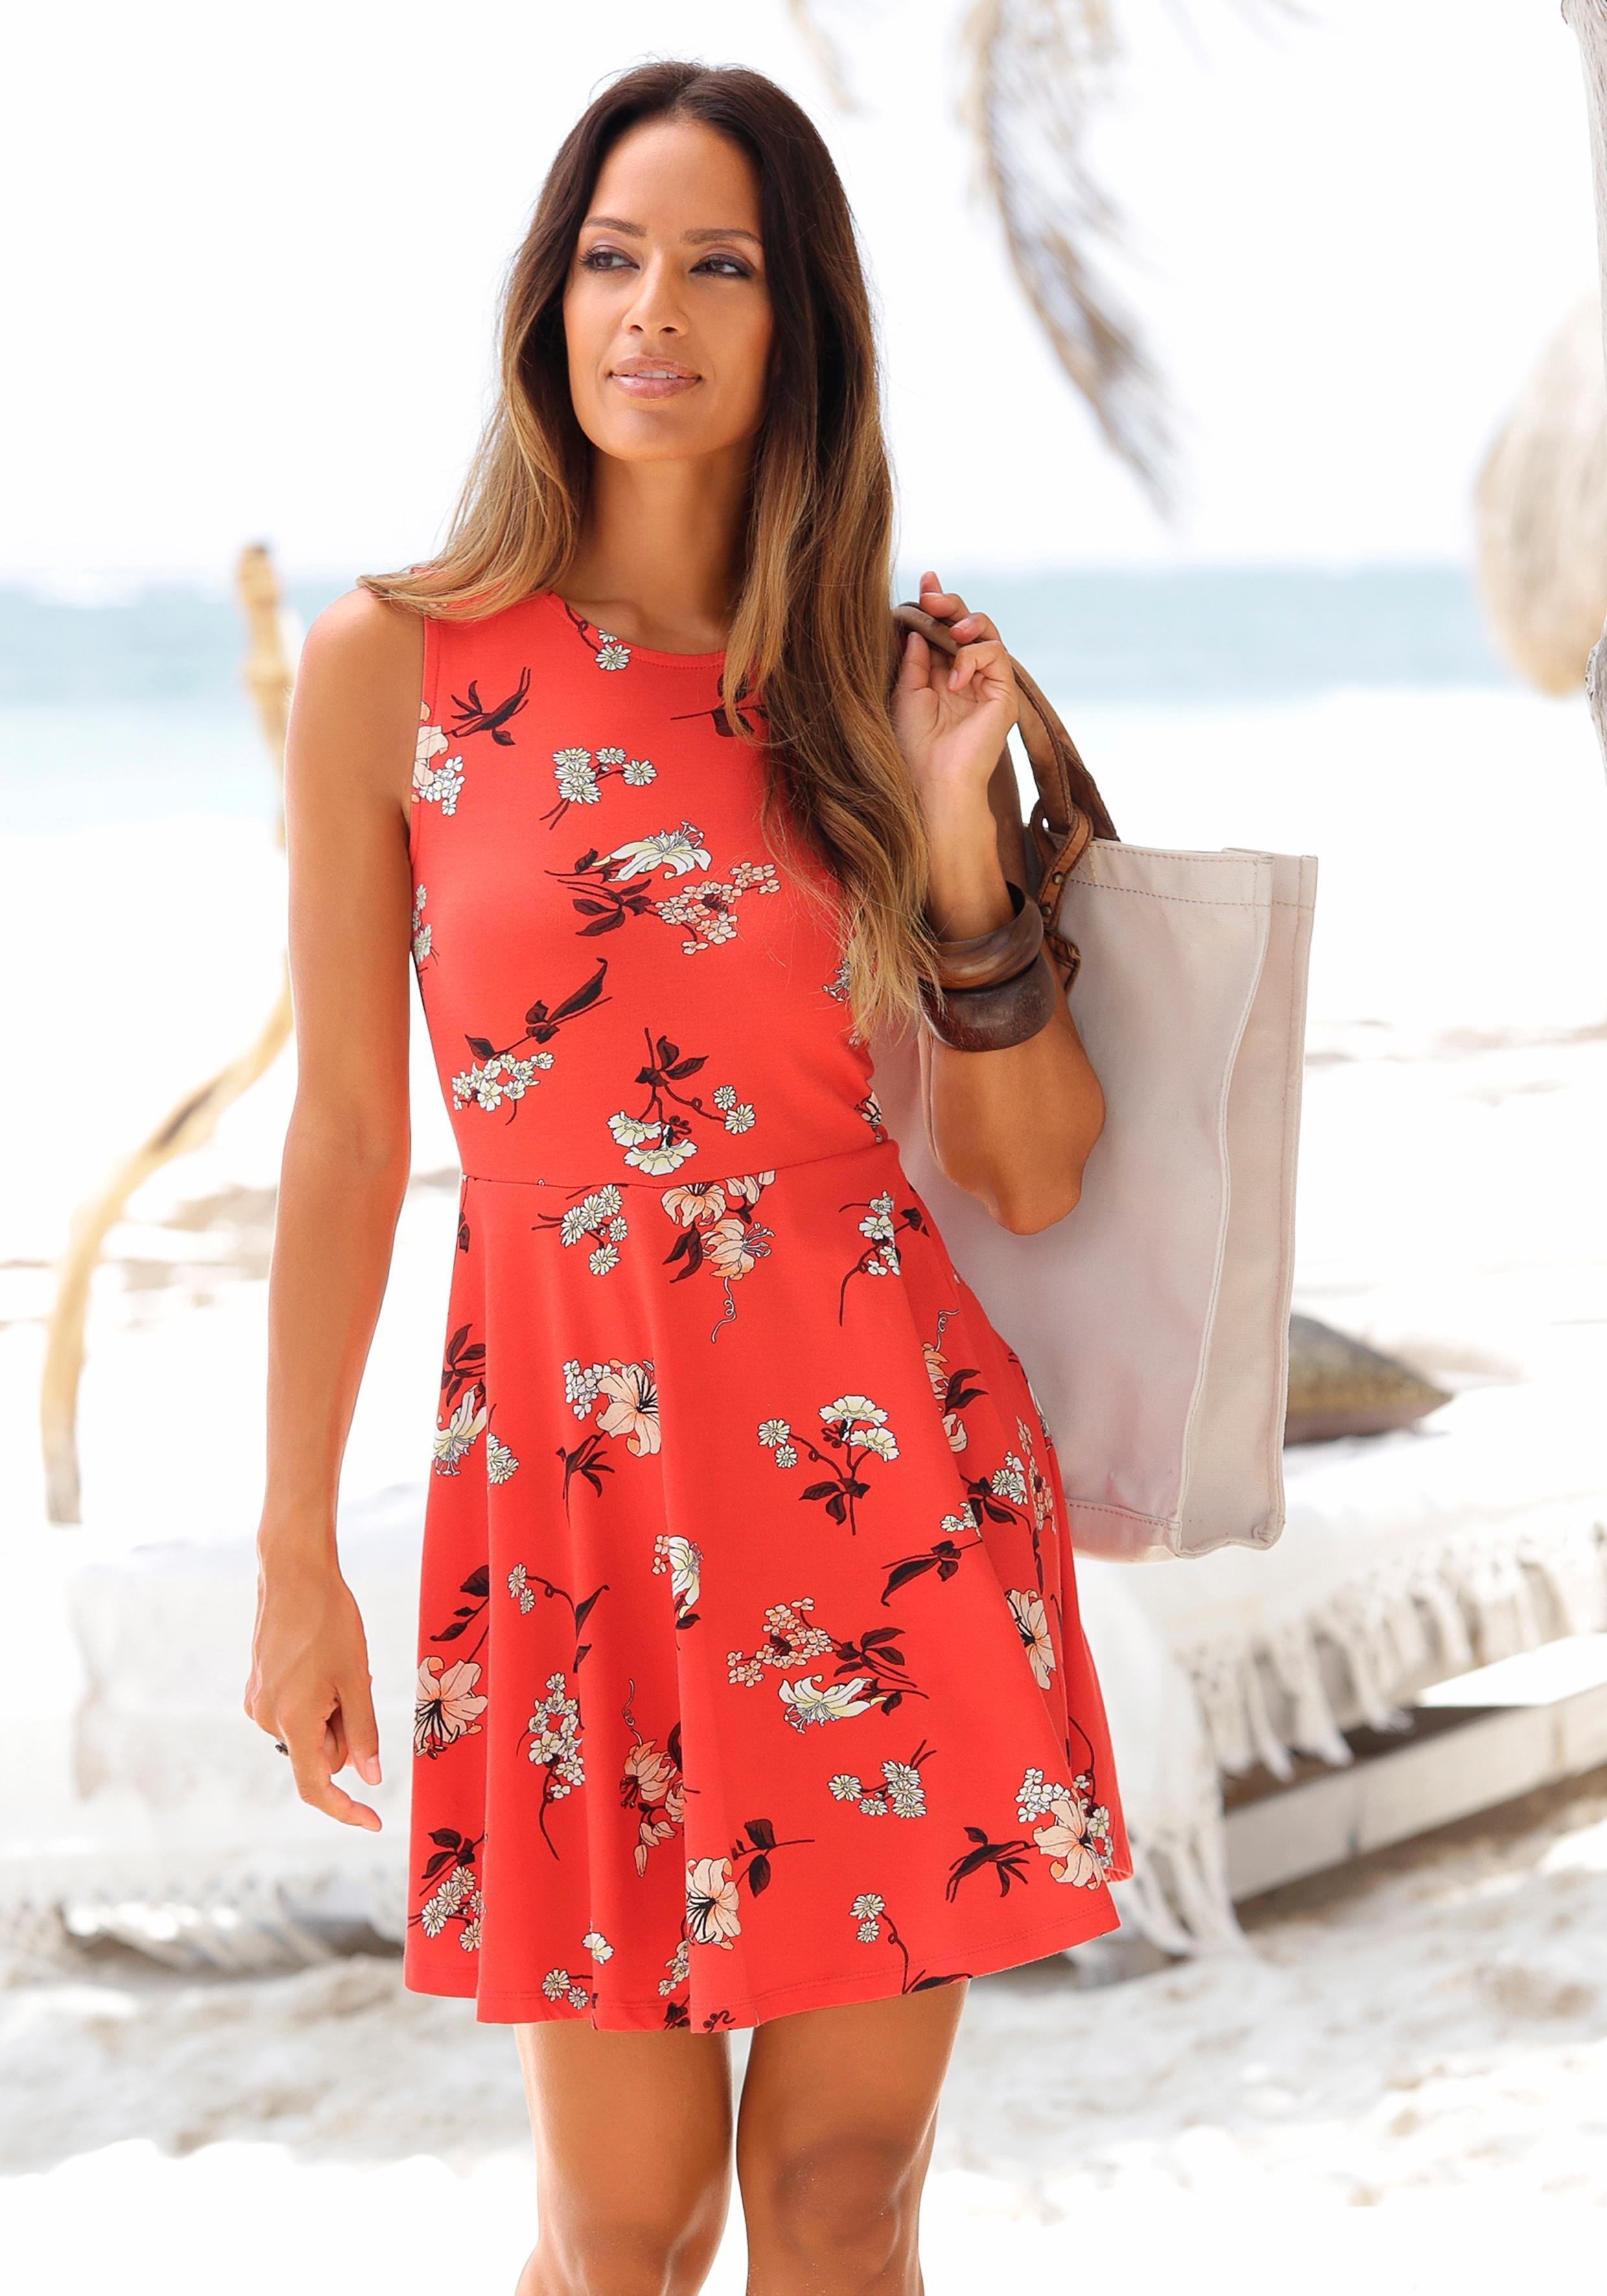 beachtime zomerjurk nu online bestellen